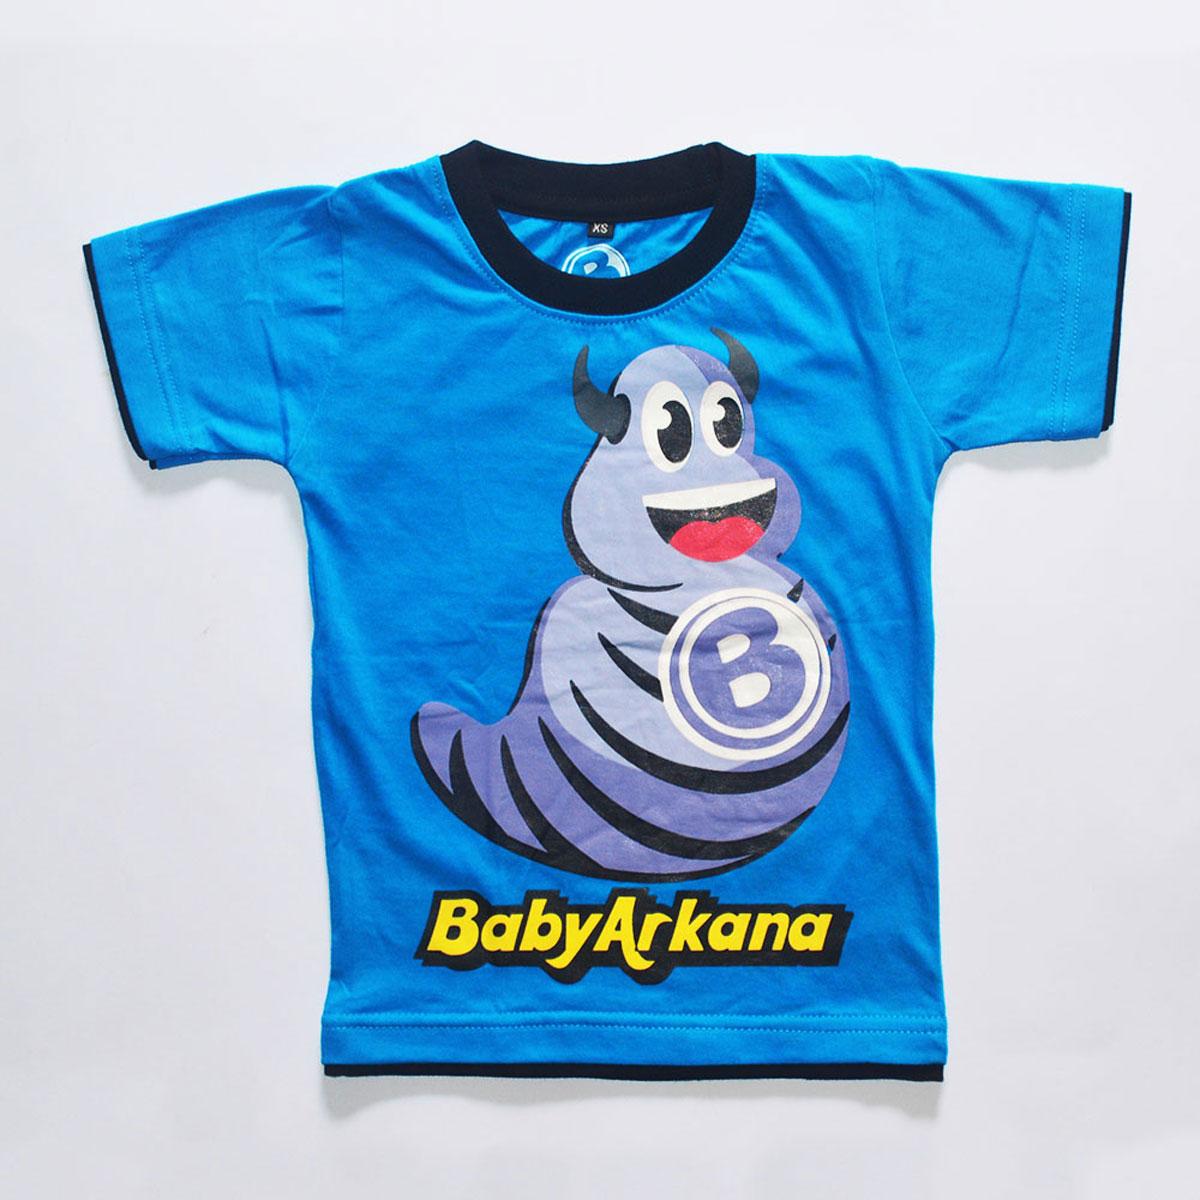 produsen baju